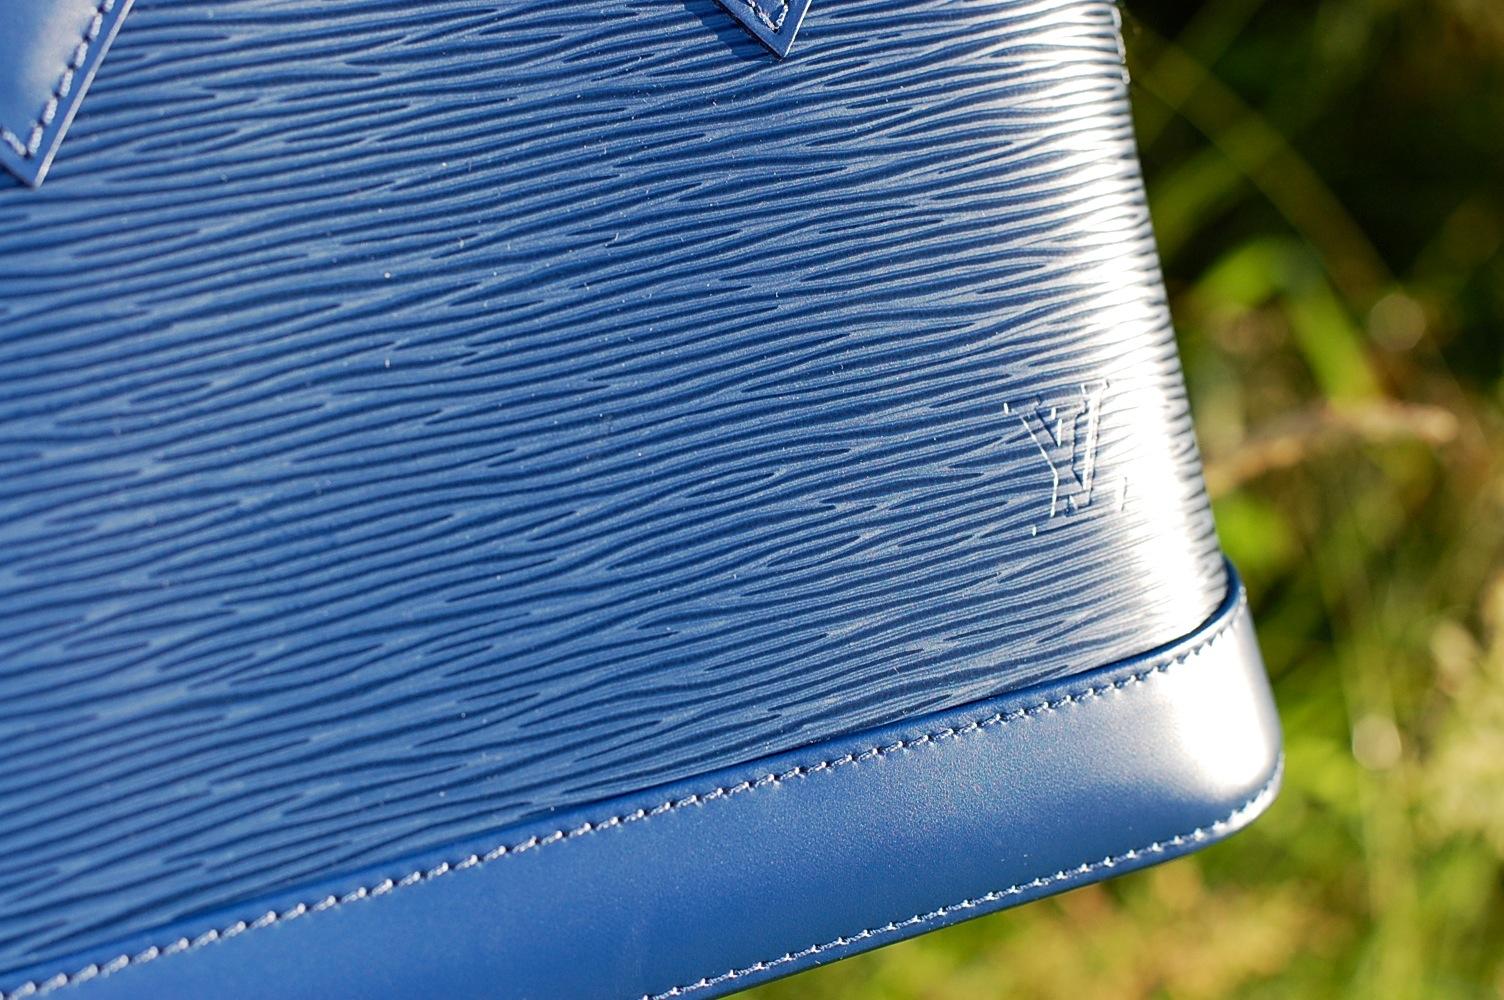 86284e19e770 Louis Vuitton Alma BB in Epi leather  A quick review